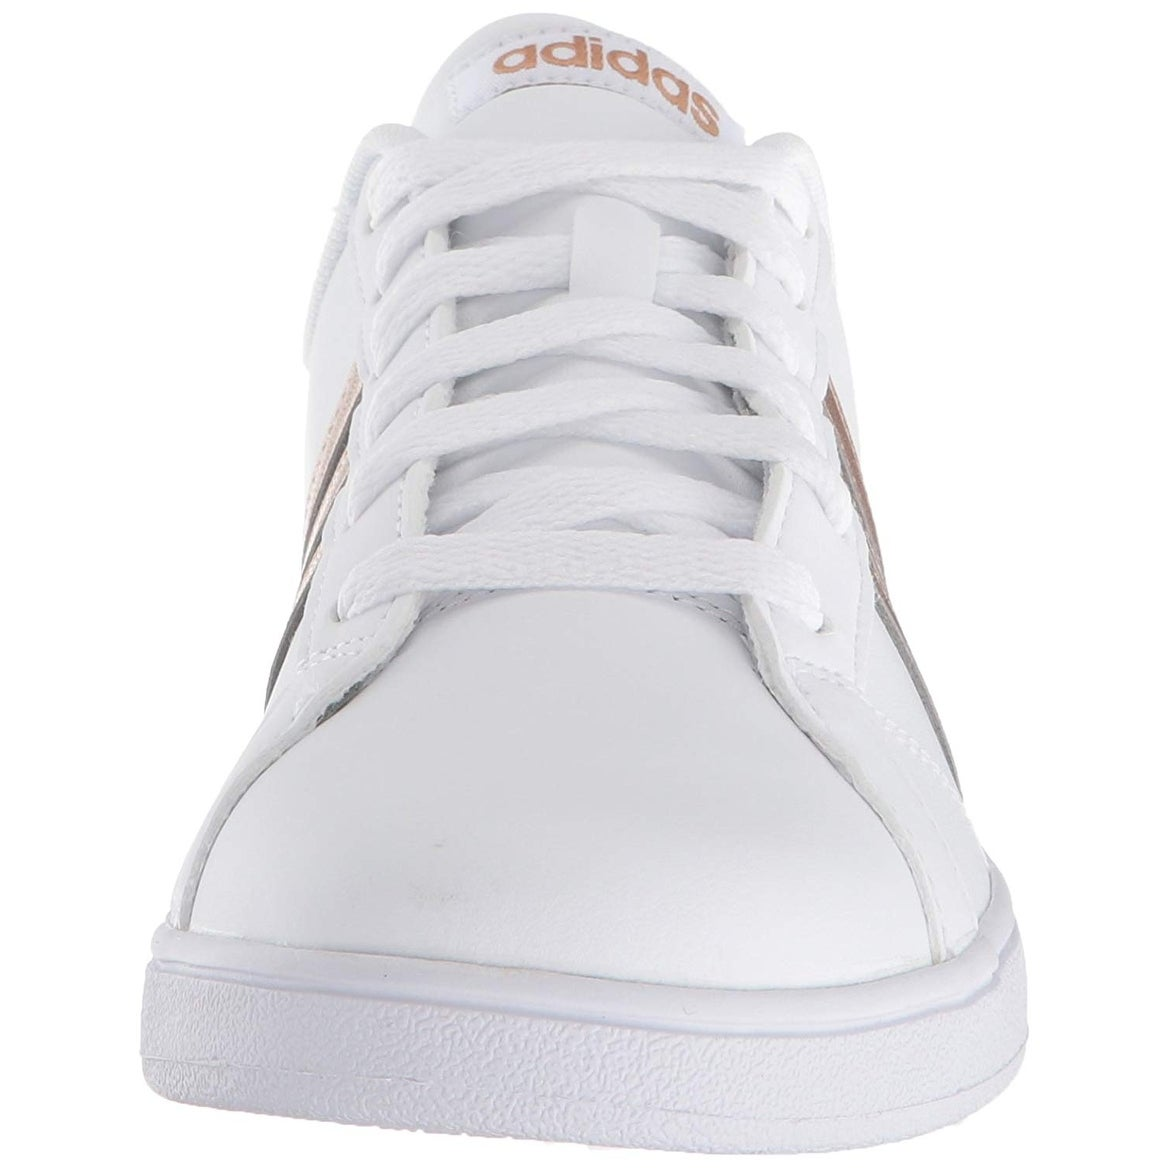 the best attitude 64b12 307e1 Shop Adidas Originals Unisex-Kids Baseline Sneaker, WhiteCopper MetallicBlack,  4.5 M Us Big Kid - Free Shipping Today - Overstock - 25592087